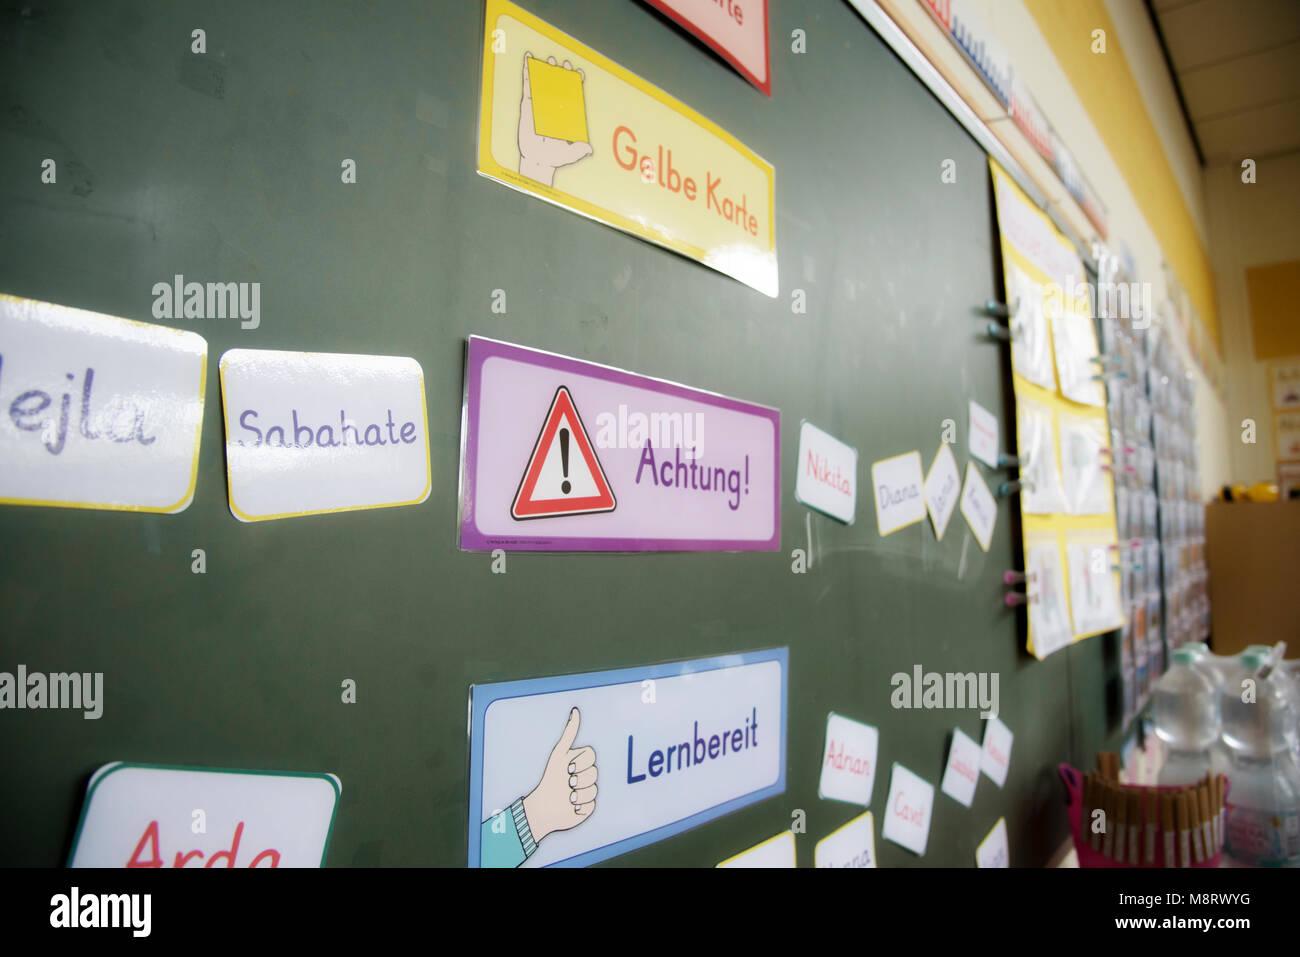 Alltag in der Grundschule - Stock Image